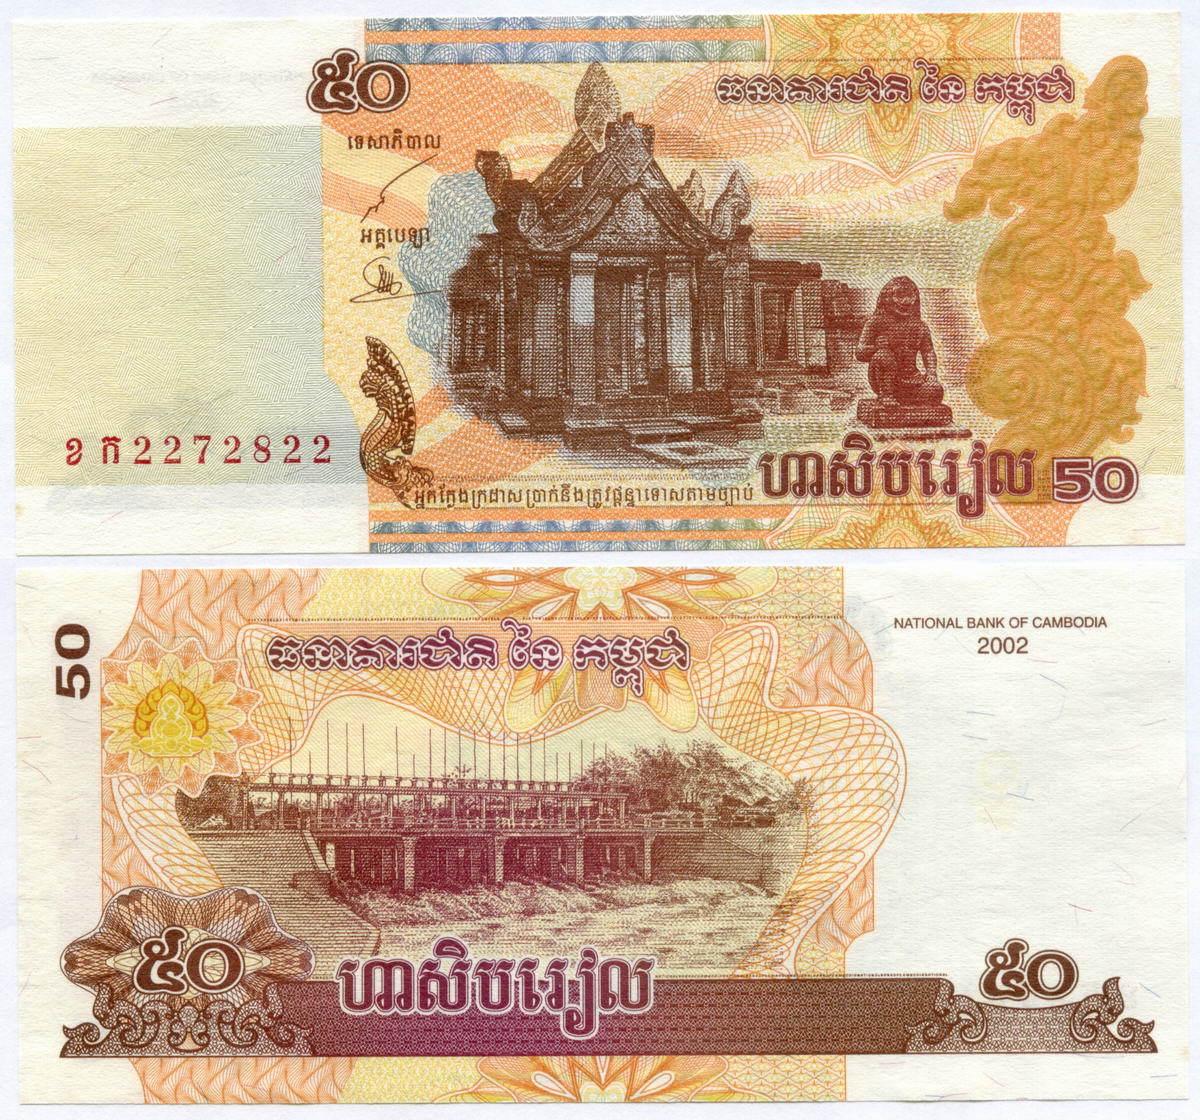 Банкнота Камбоджа 50 риелей 2002 год № 22722822. UNC